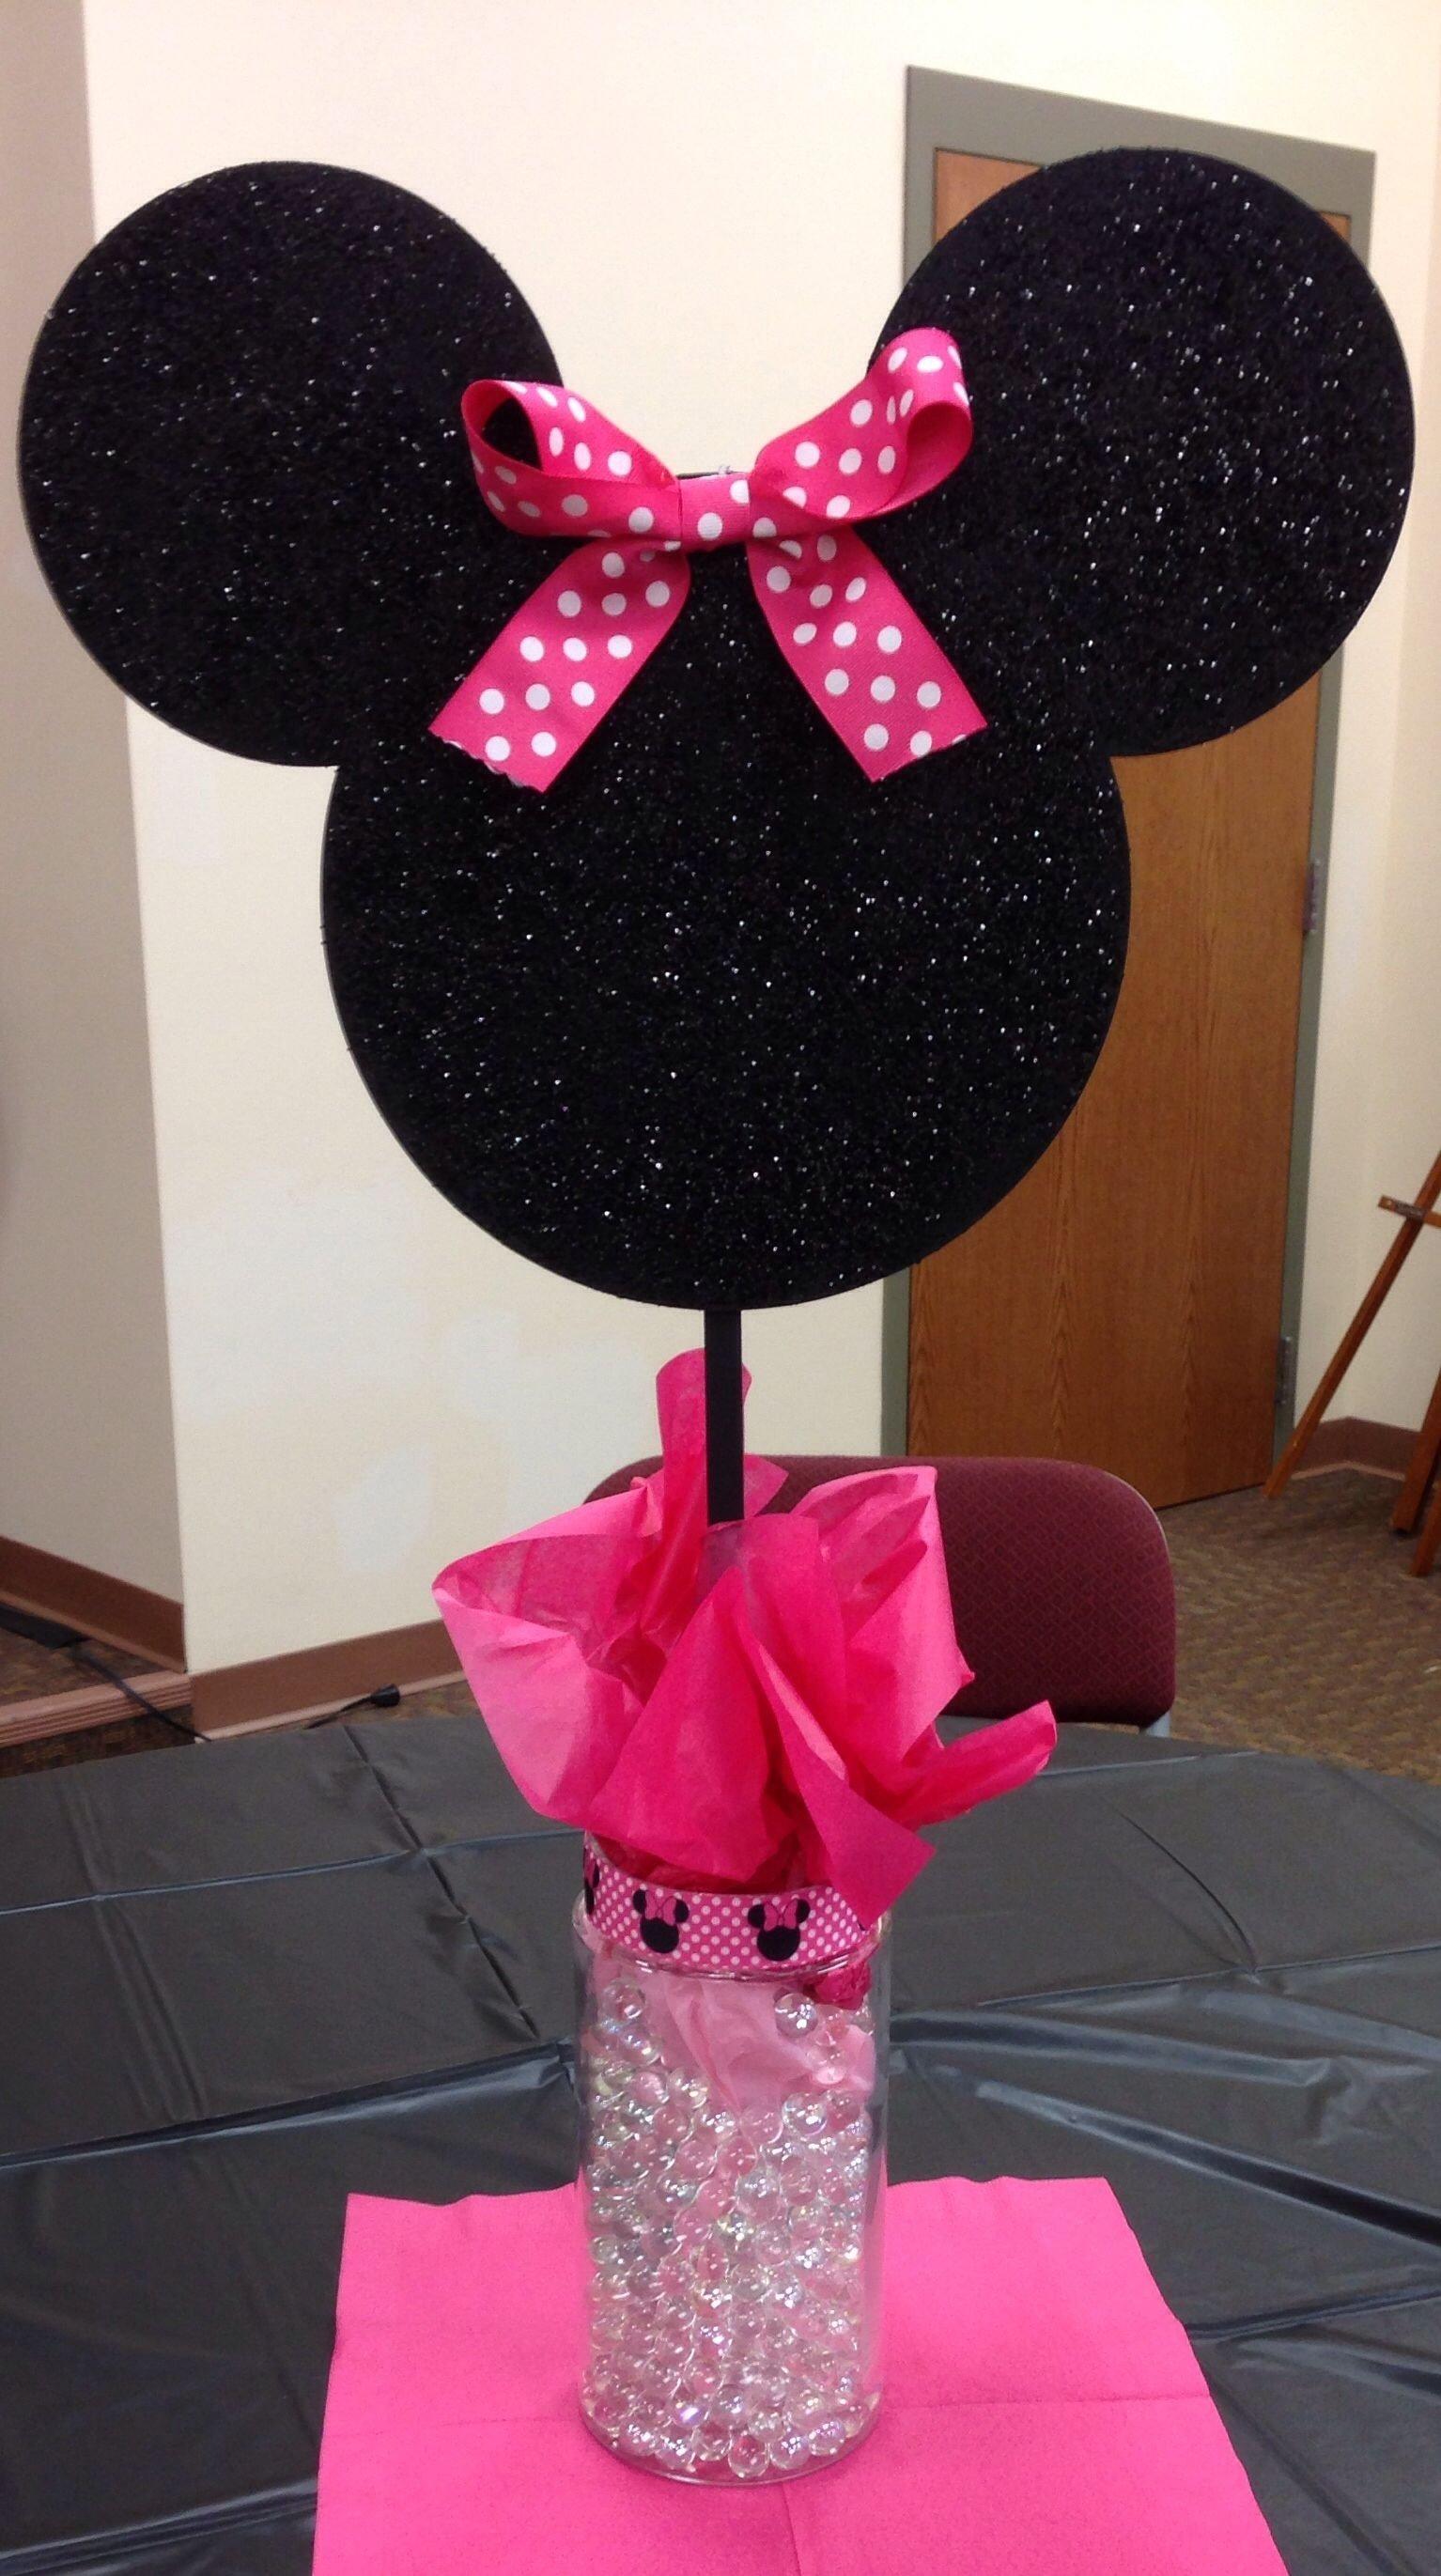 10 Fabulous Minnie Mouse Party Decoration Ideas minnie mouse centerpieces first birthday decorations minnie theme 7 2020